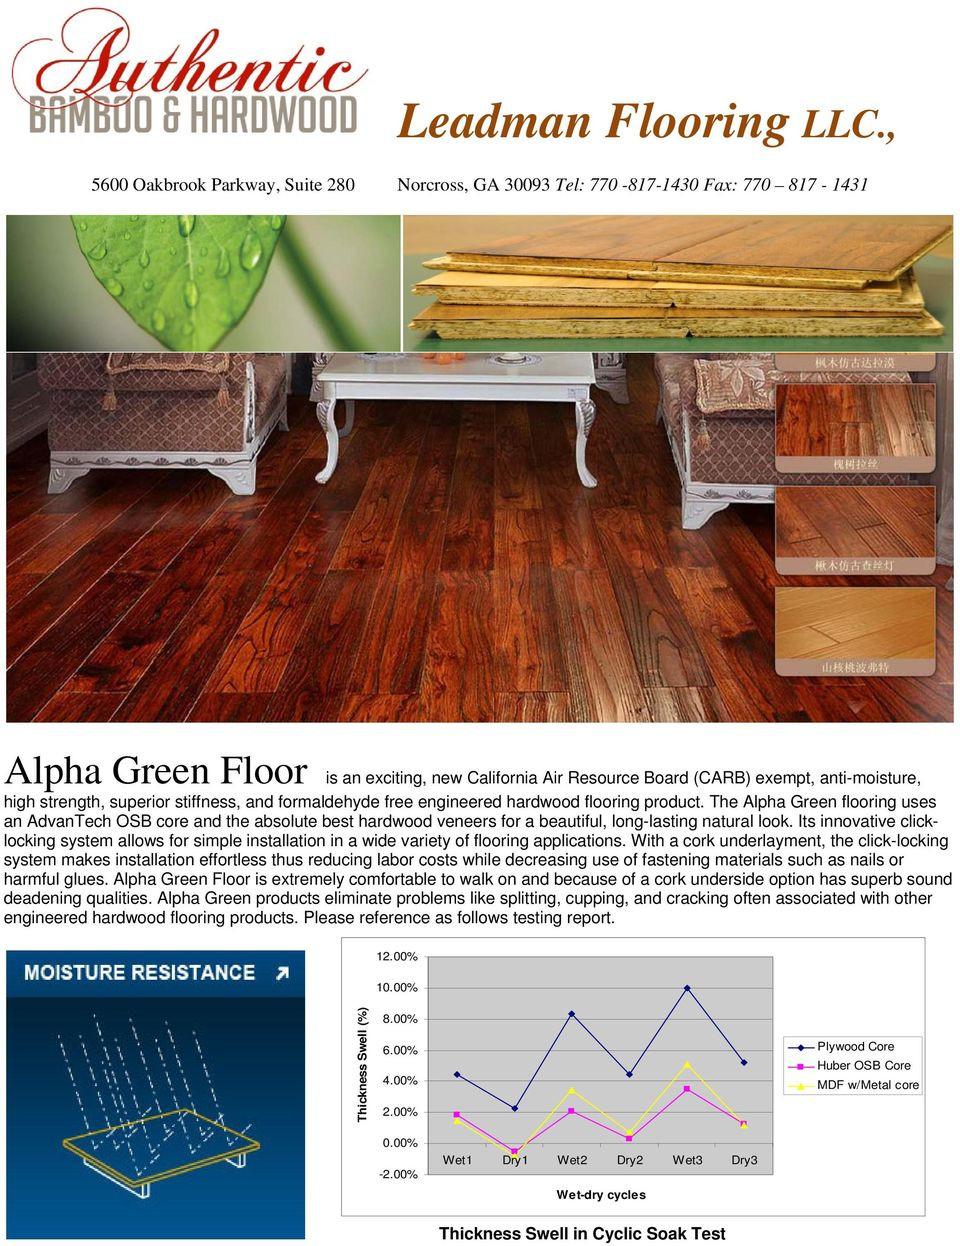 gaps in engineered hardwood floor of leadman flooring llc pdf with strength superior stiffness and formaldehyde free engineered hardwood flooring product